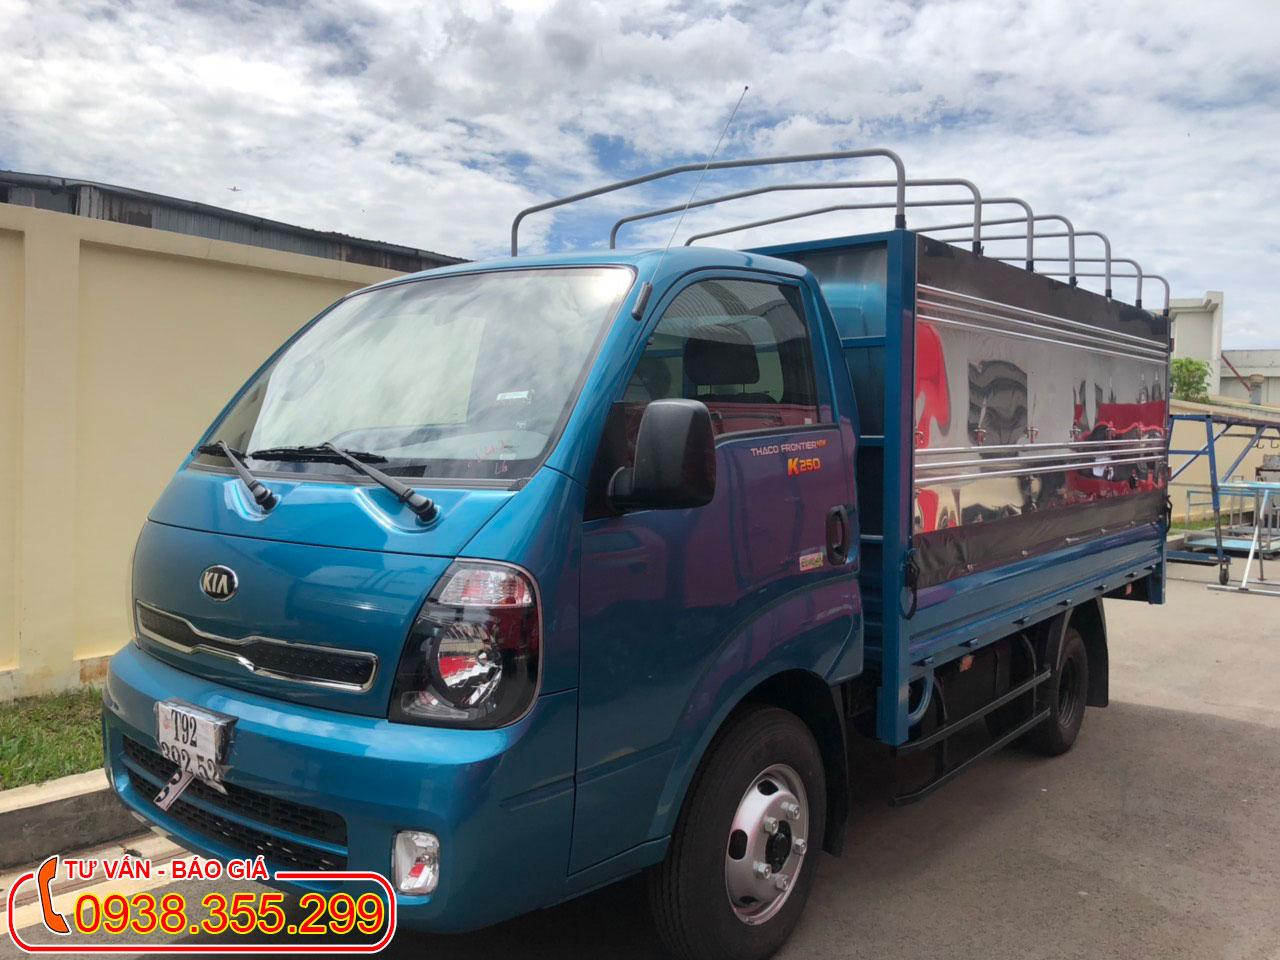 kia-frontier-k250